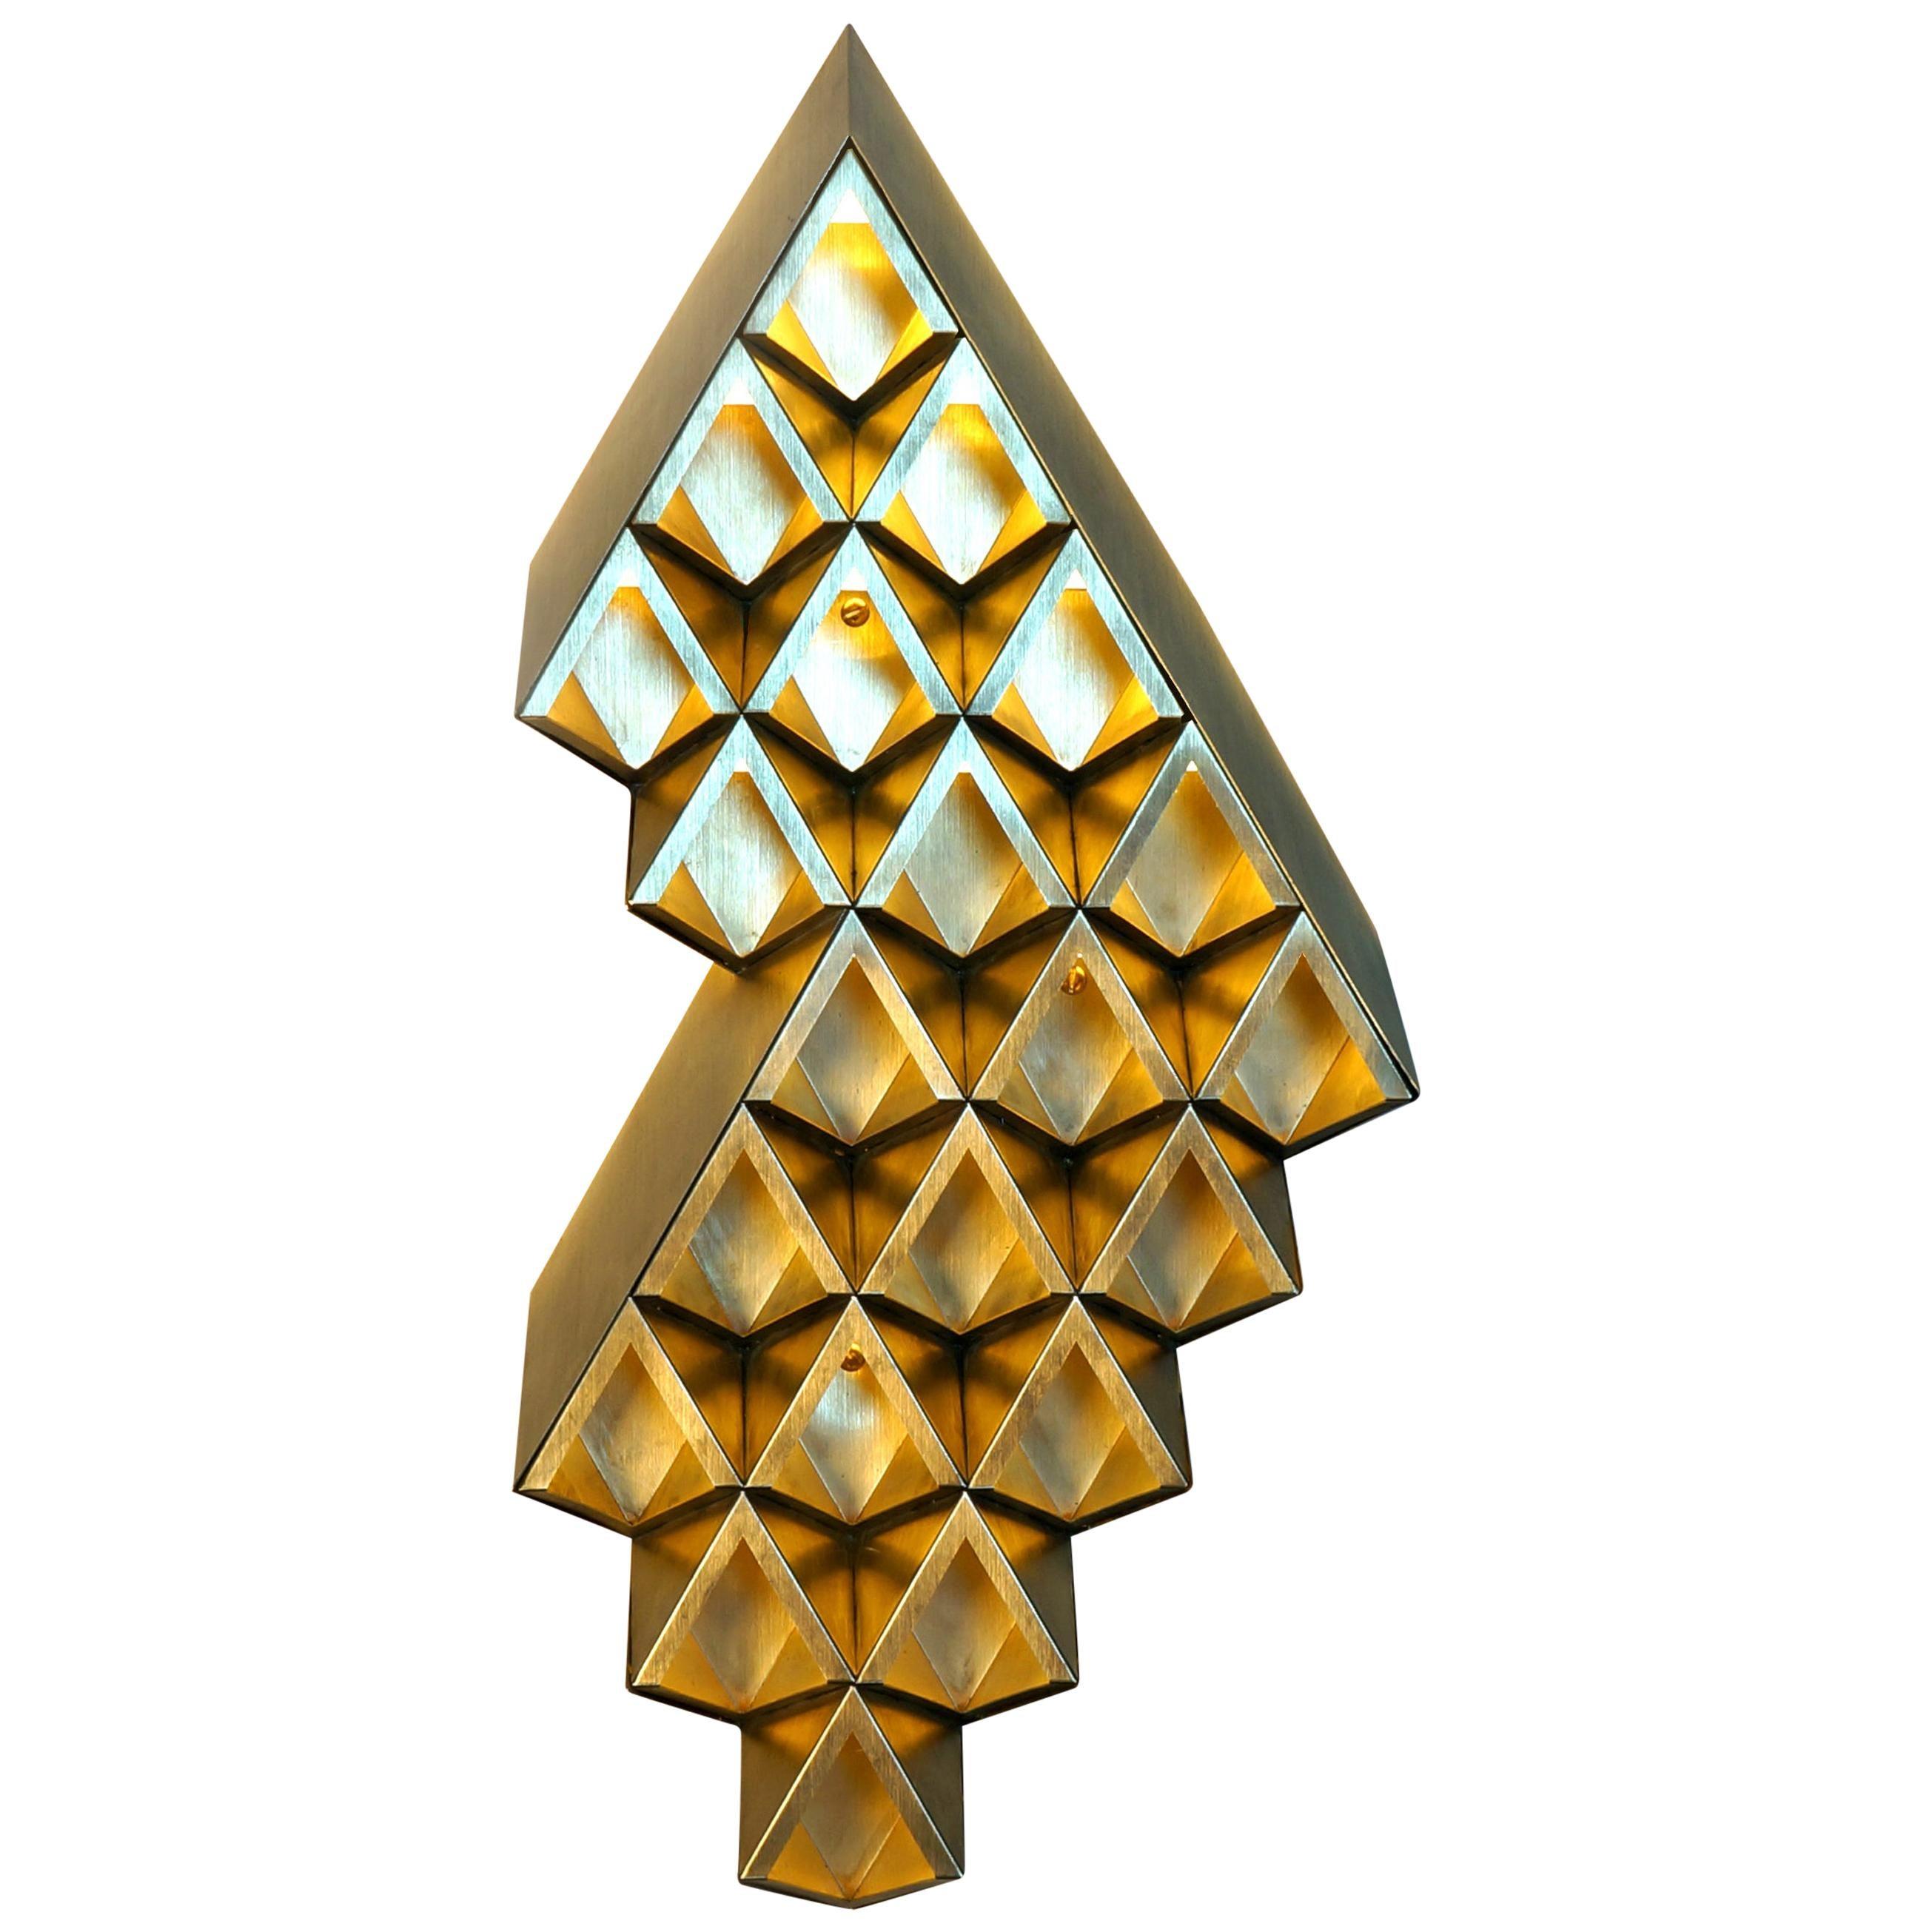 Sharp Diamond Light, Brass Sconce in Diamond and Customizable Configurations